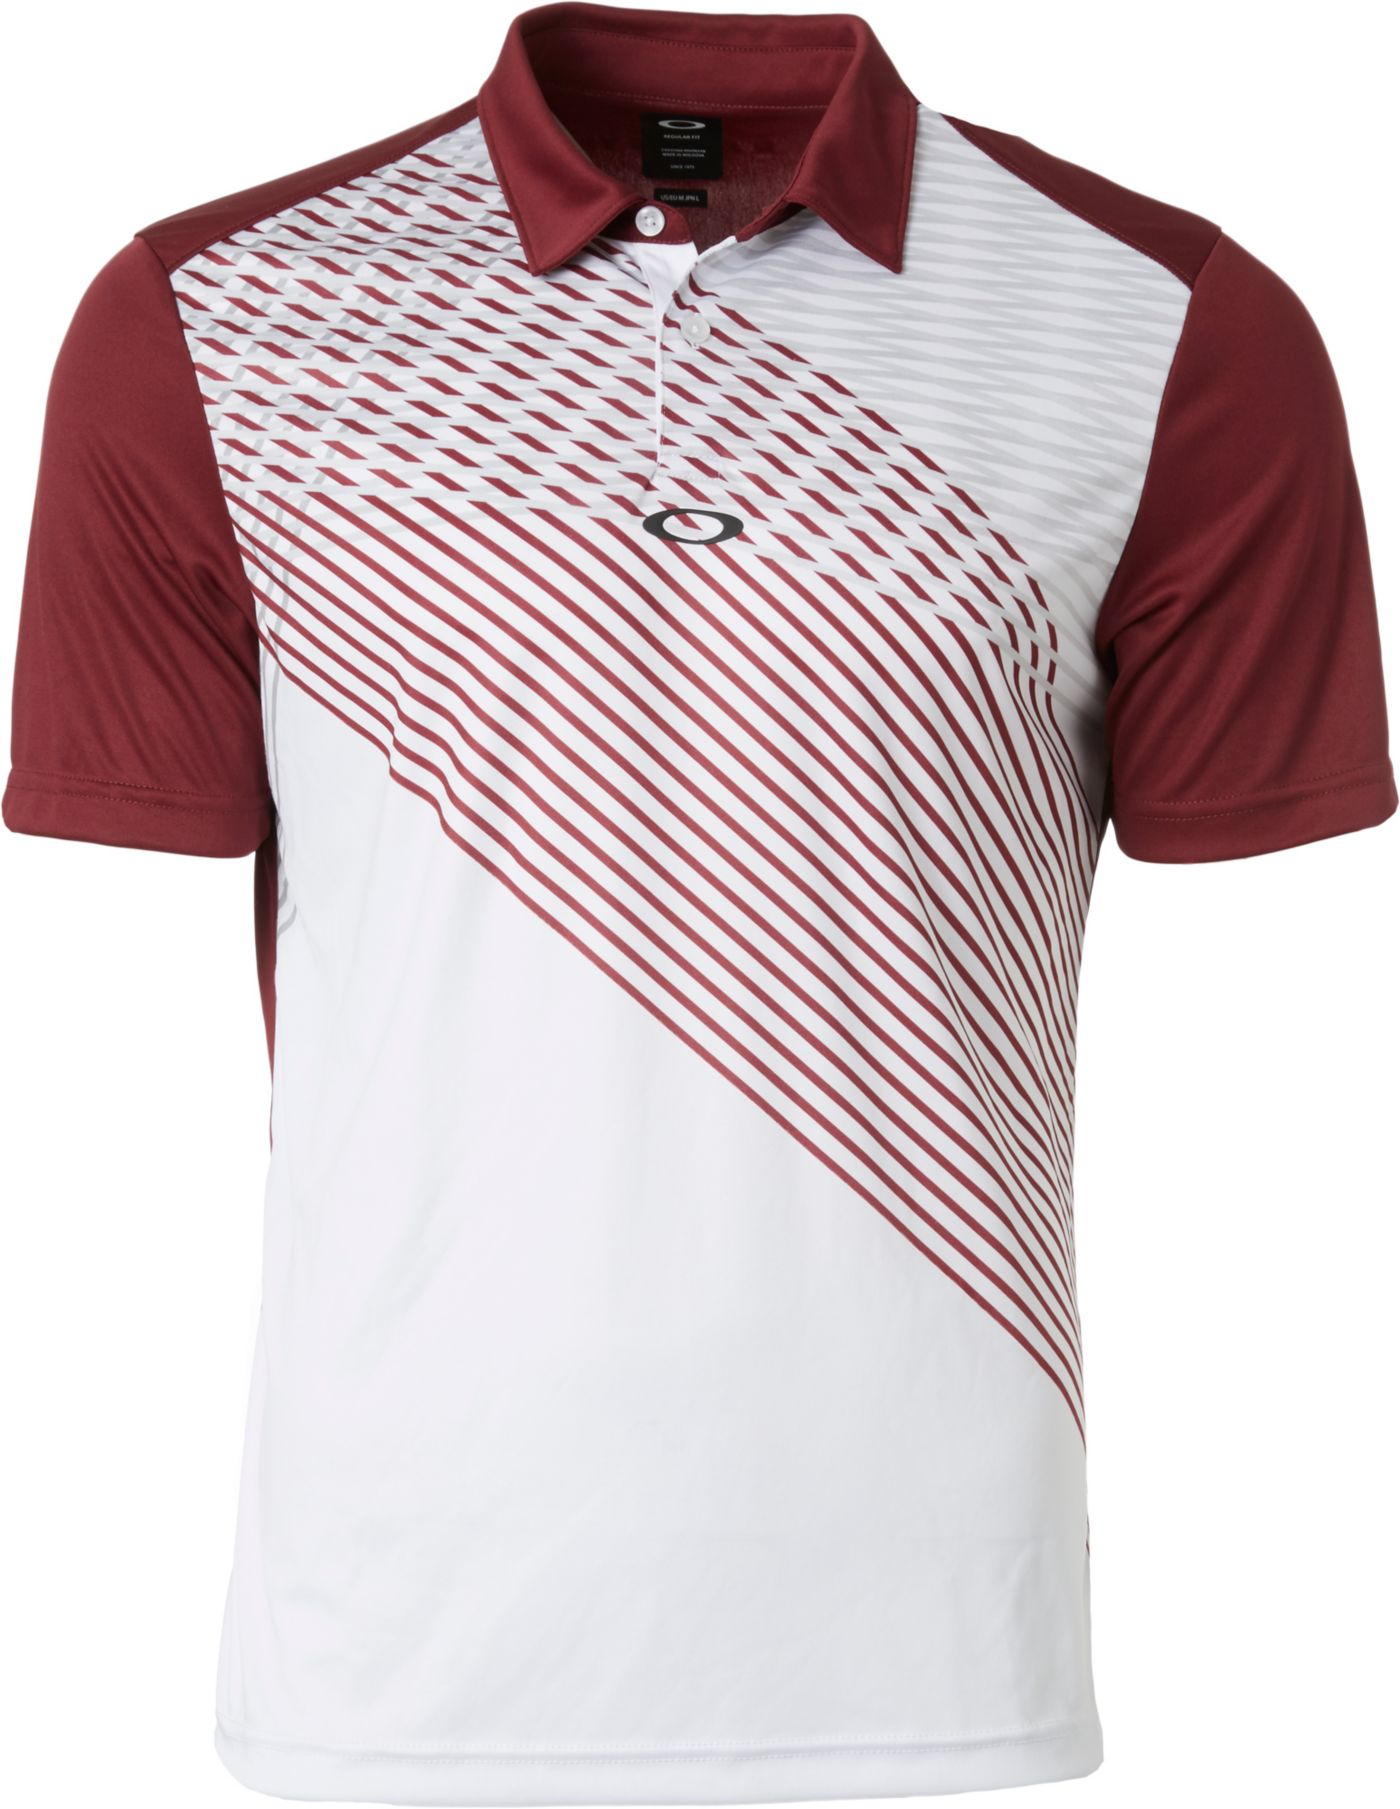 Oakley Men's Infinity Vertical Line Golf Polo